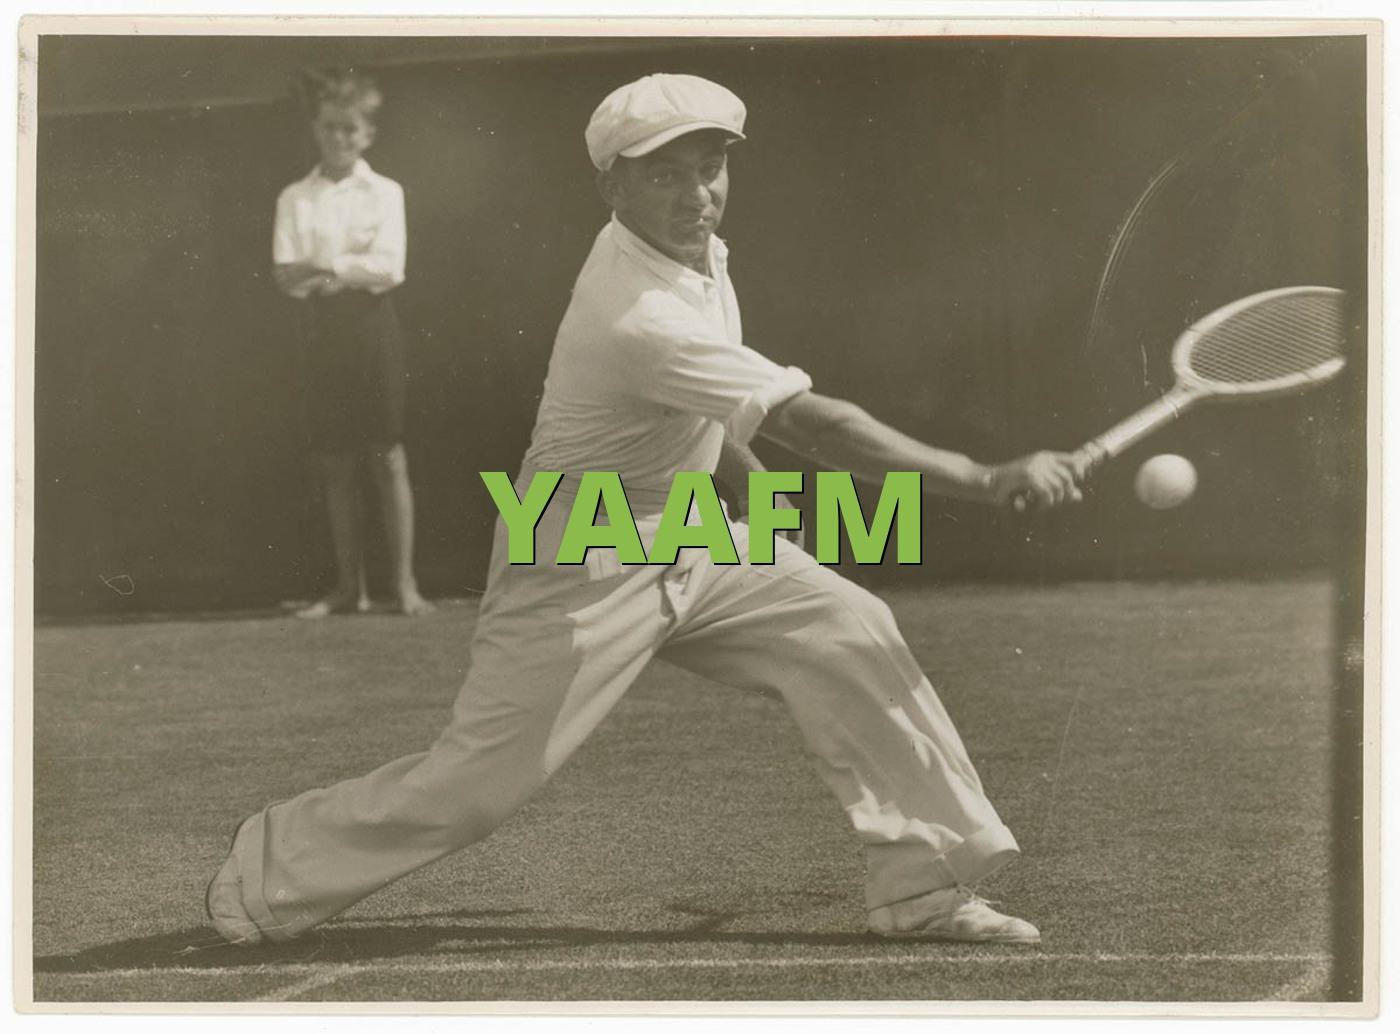 YAAFM